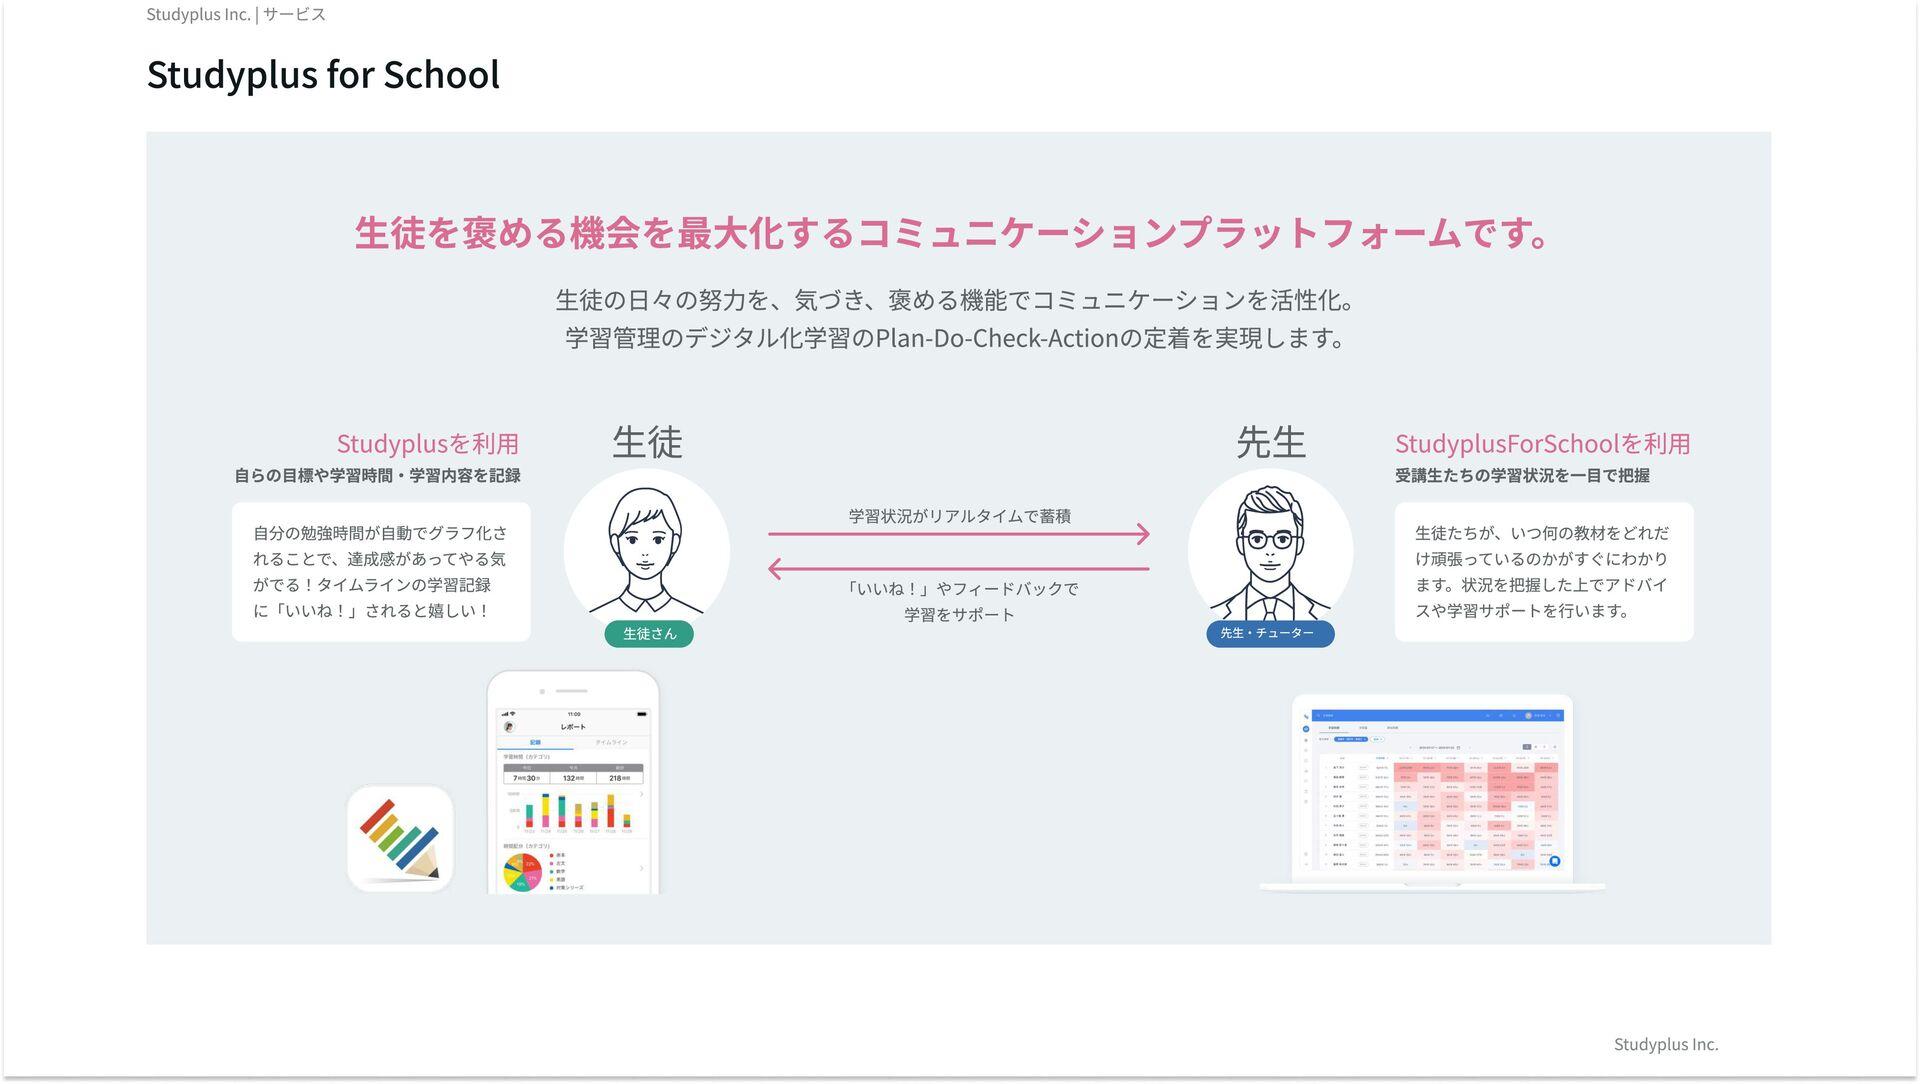 PORTO 人気参考書をスマホで読み放題の  電子参考書アプリ